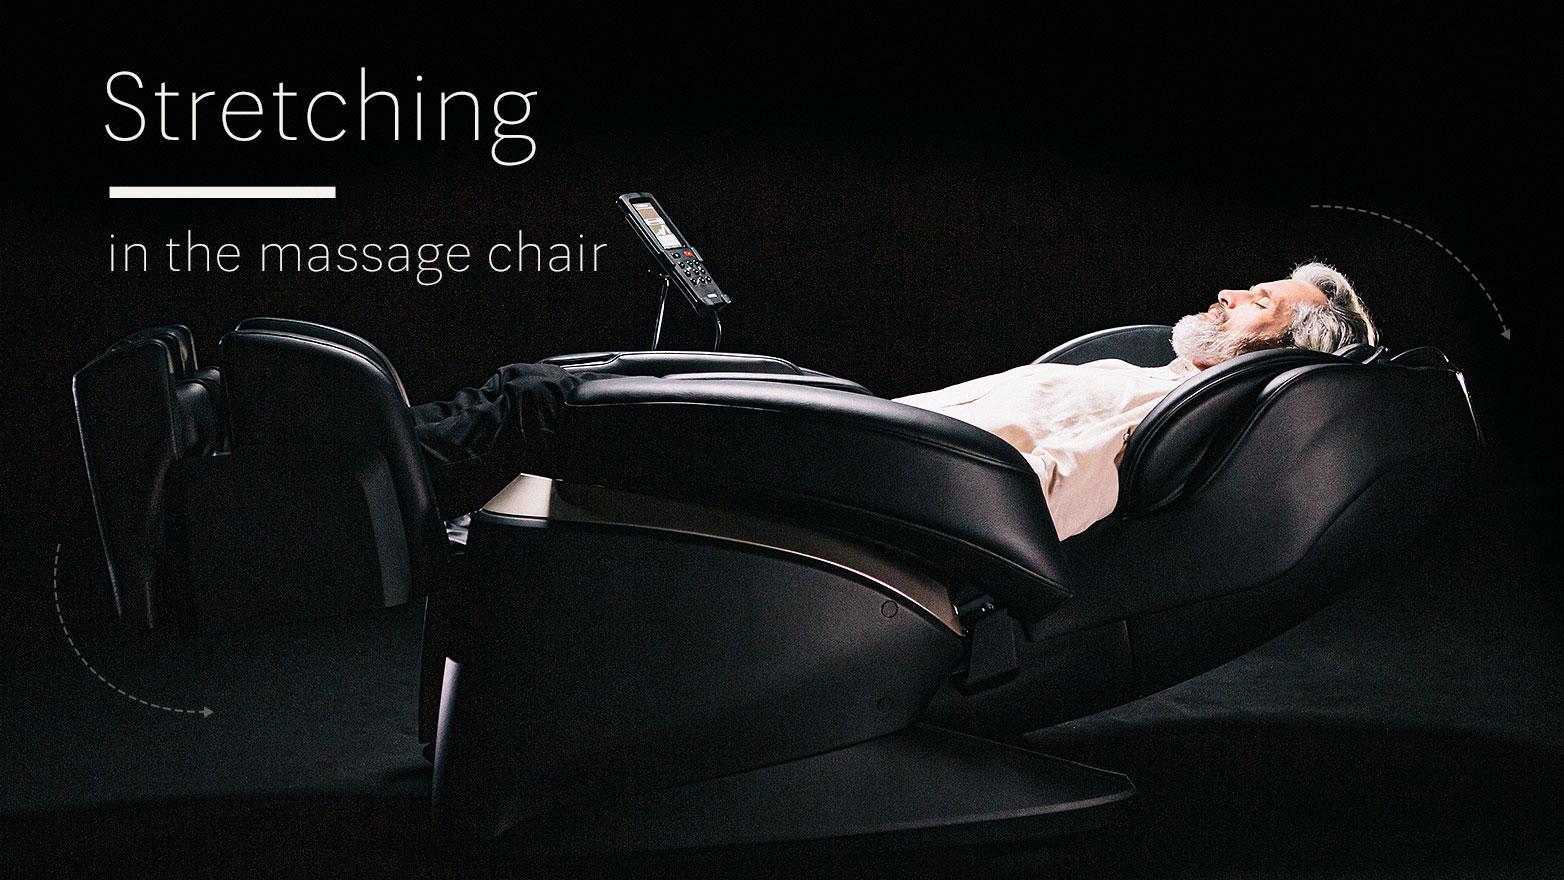 Stretching massage chairs 2021